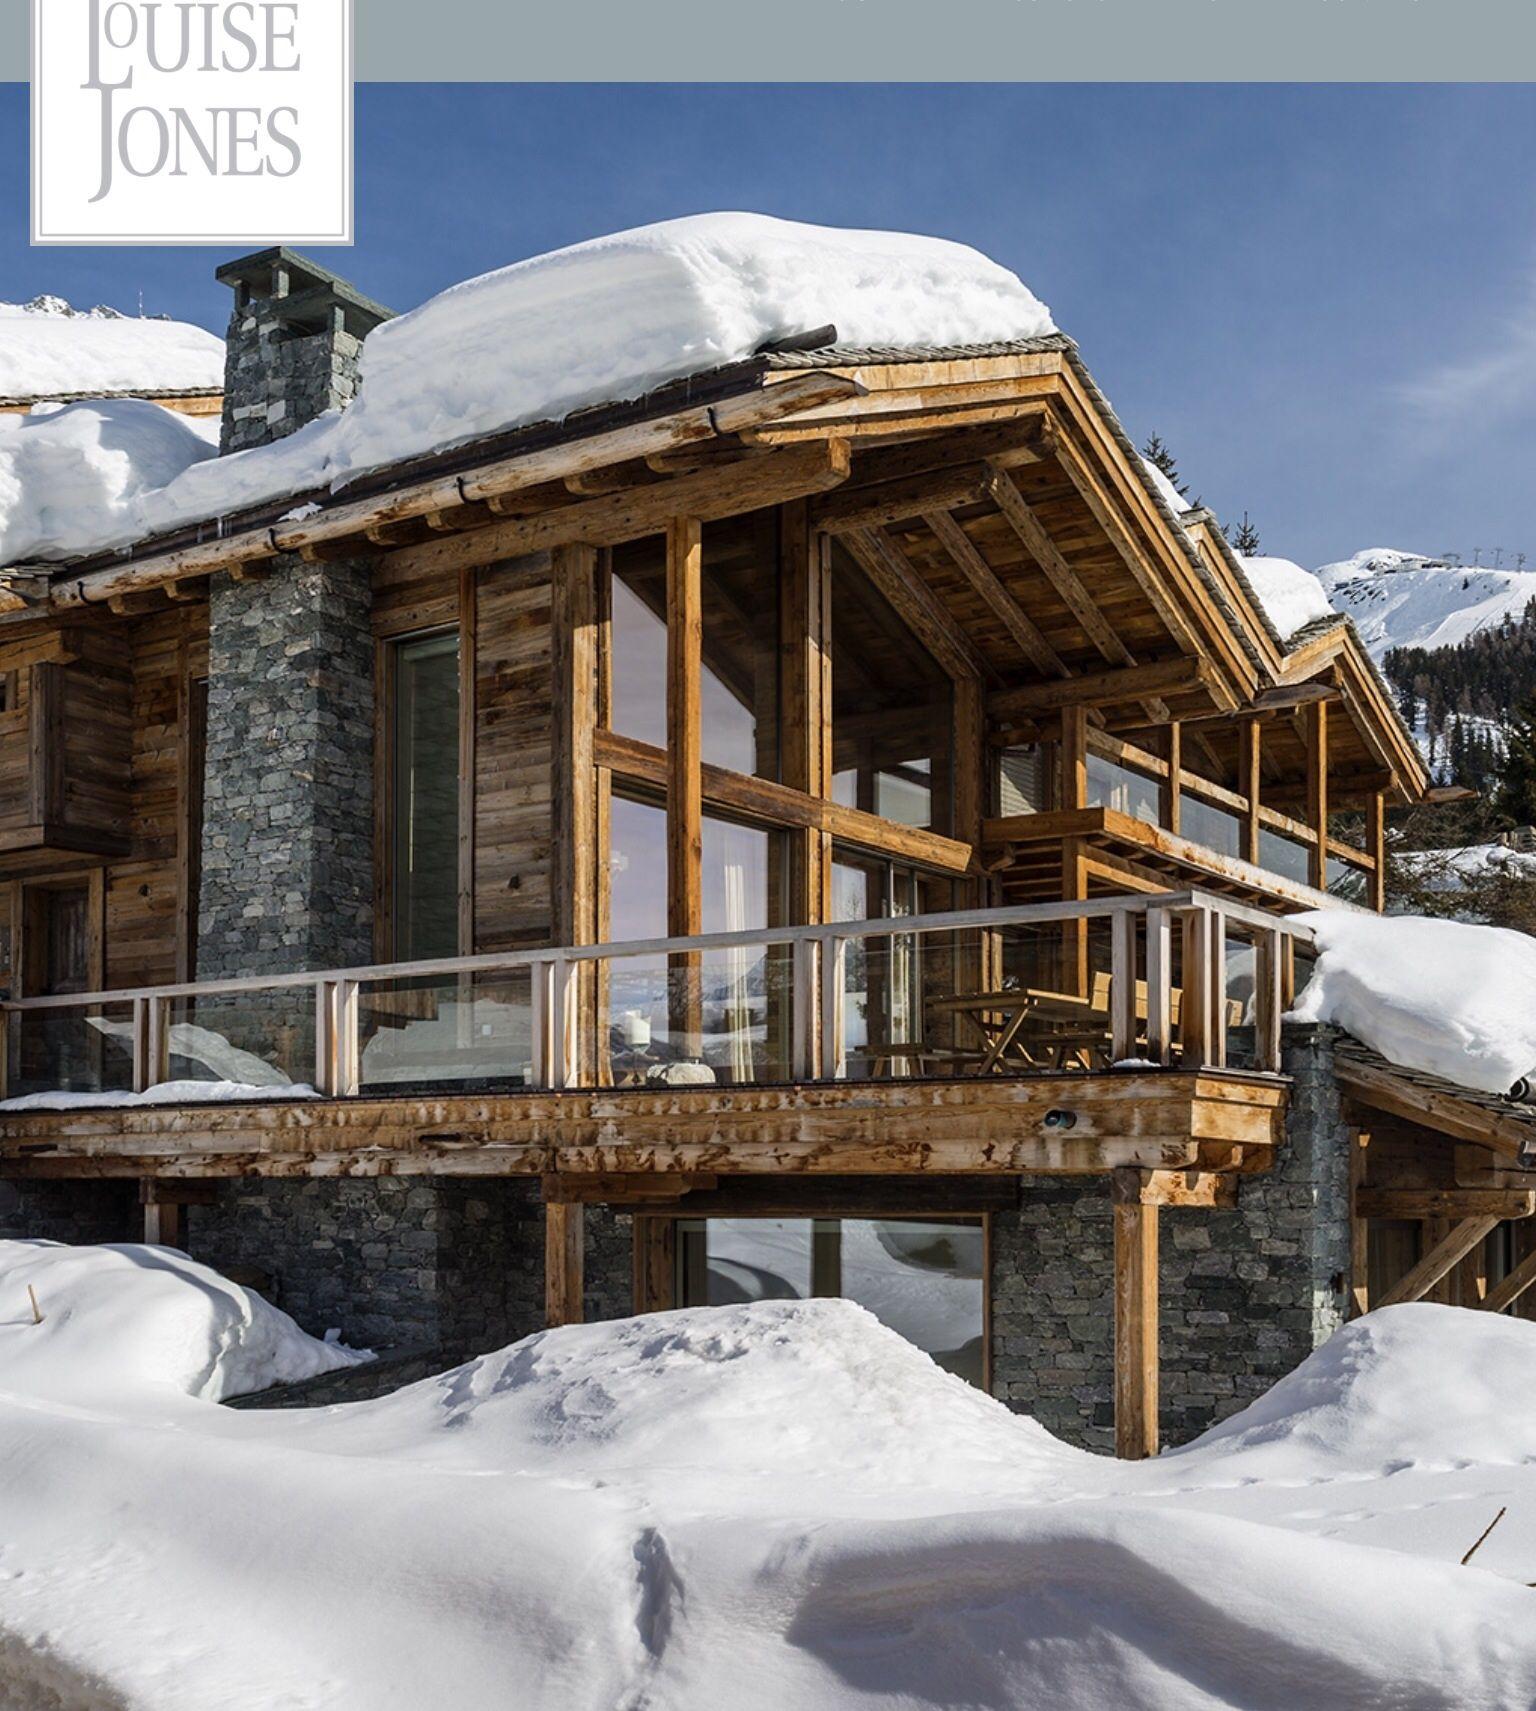 Reihe nach hause exterieur design pin by pavel Špaček on chalets  pinterest  cabin mountain homes